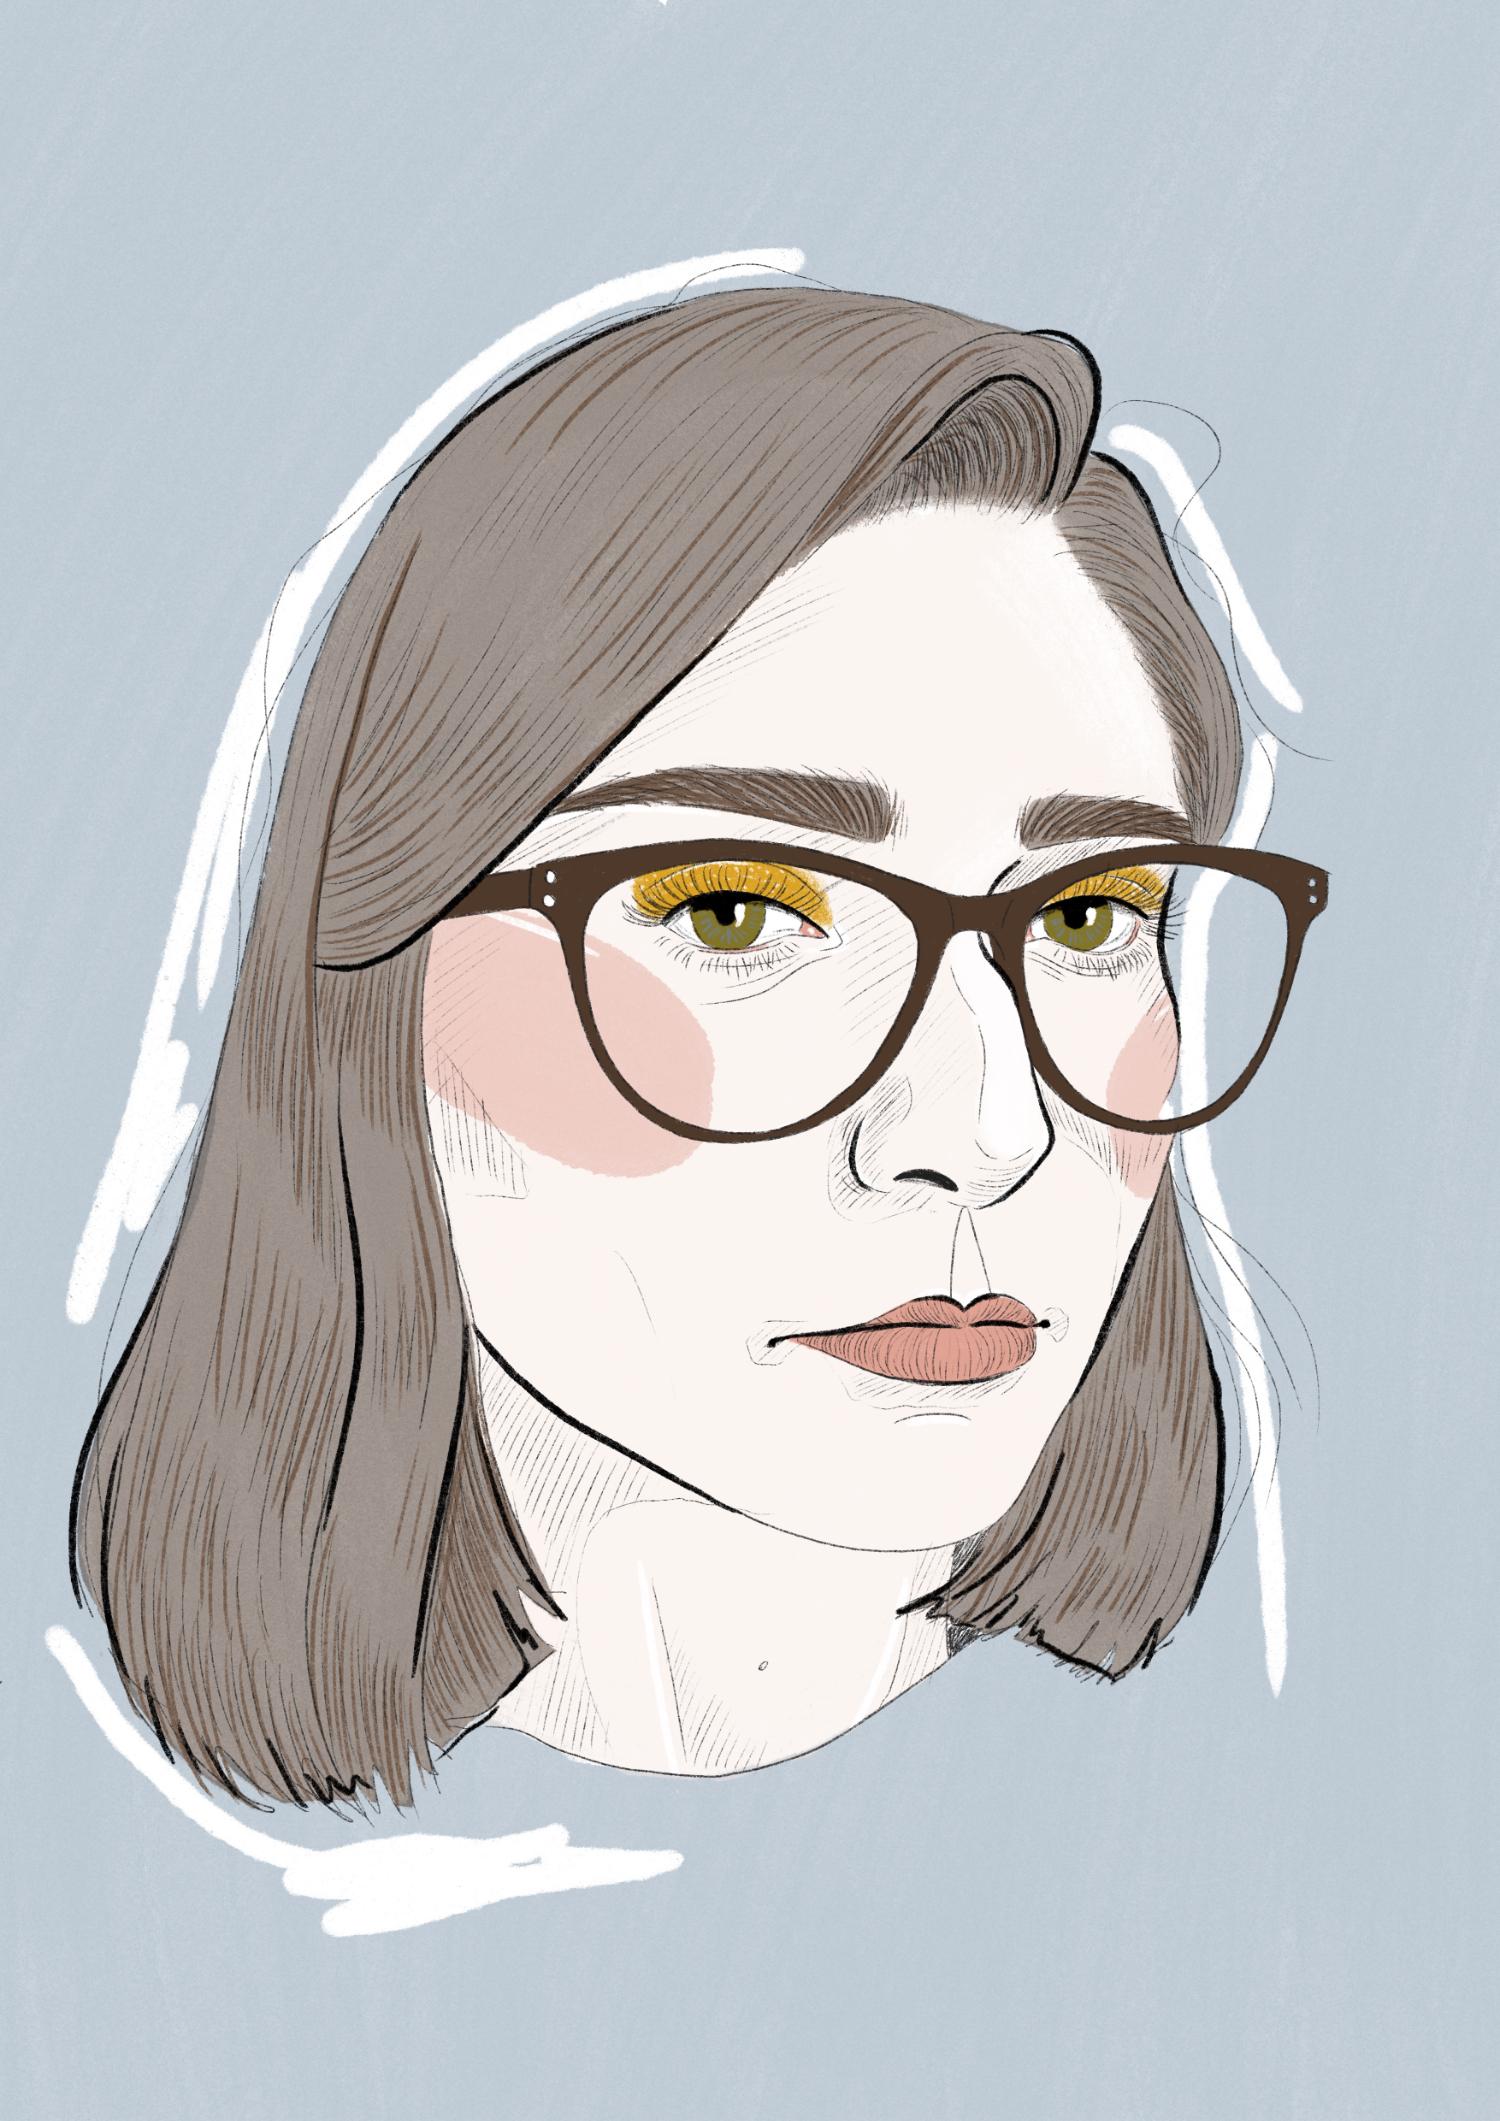 Self Portrait March 2019